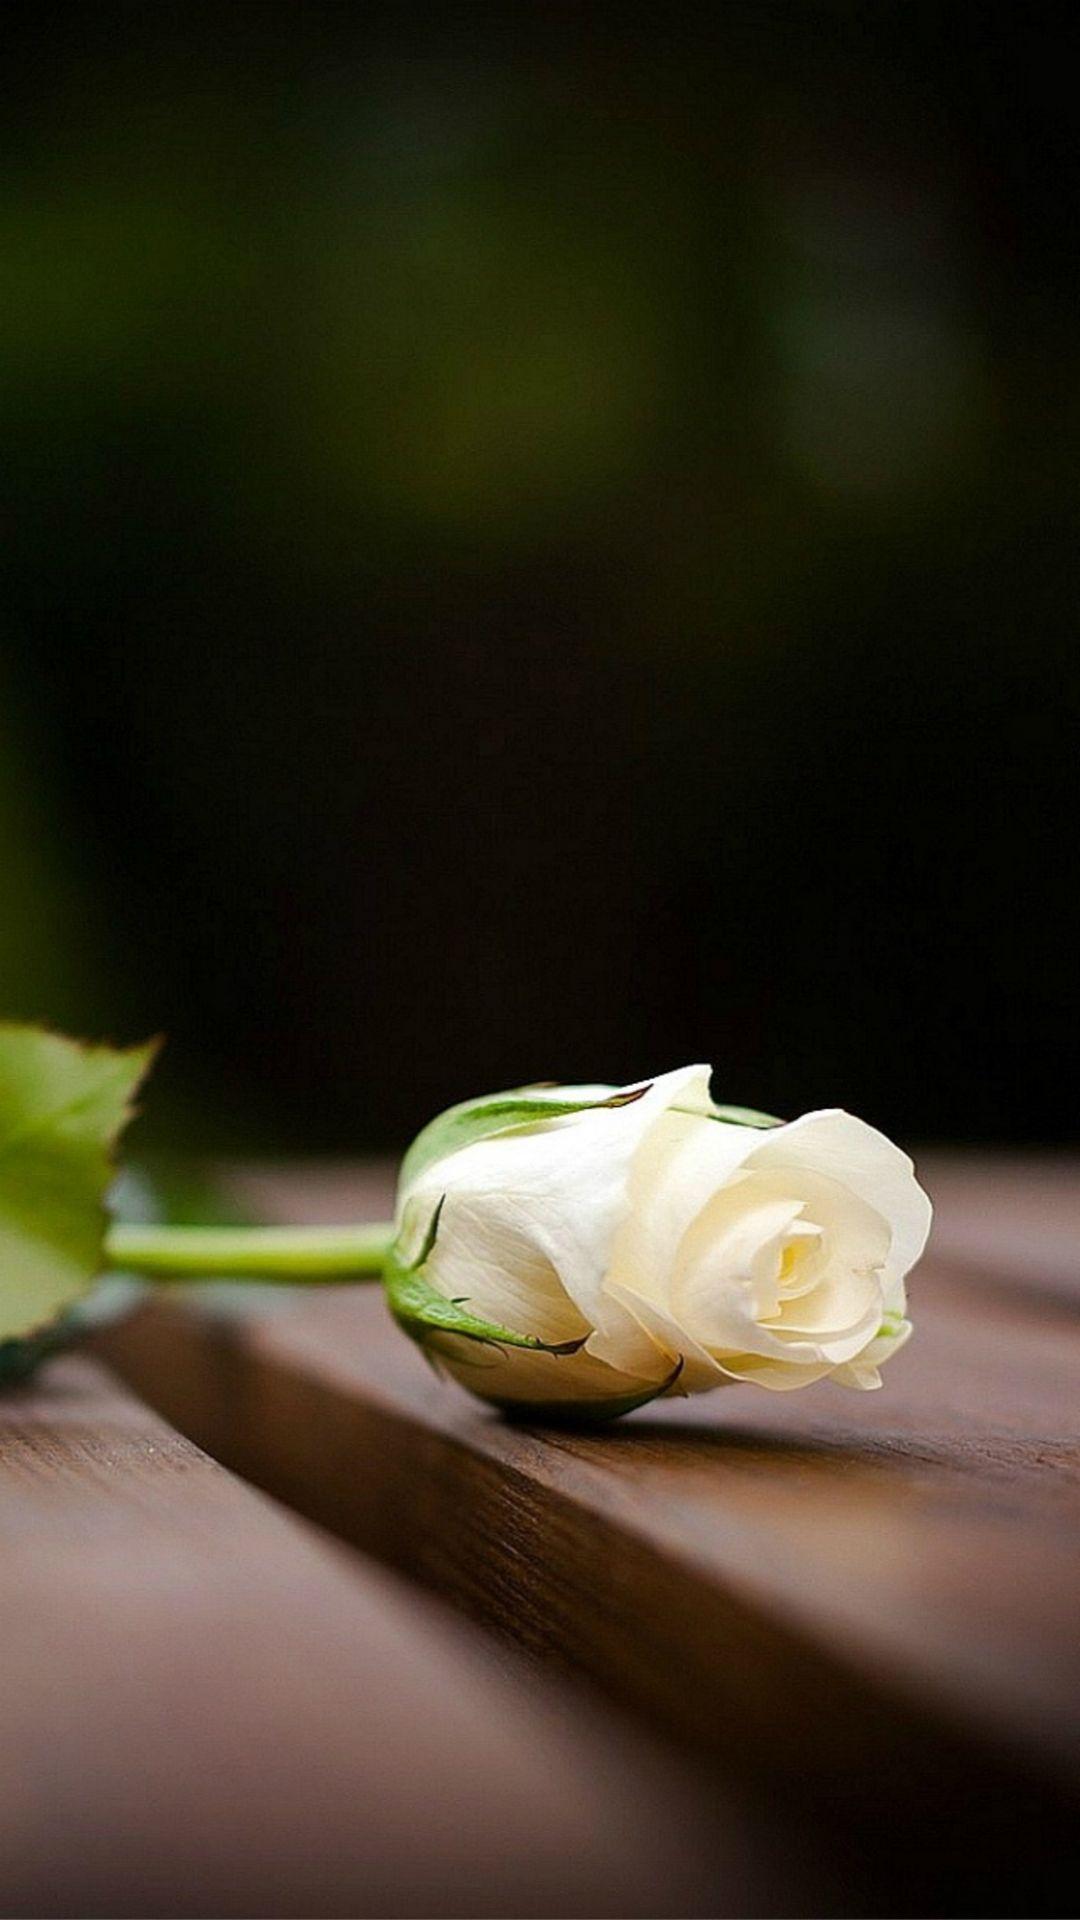 Elegant White Rose On Wood Blur Iphone 6 Wallpaper Download Iphone Wallpapers Ipad Wallpapers One Rose Flower Wallpaper White Roses Wallpaper Rose Wallpaper